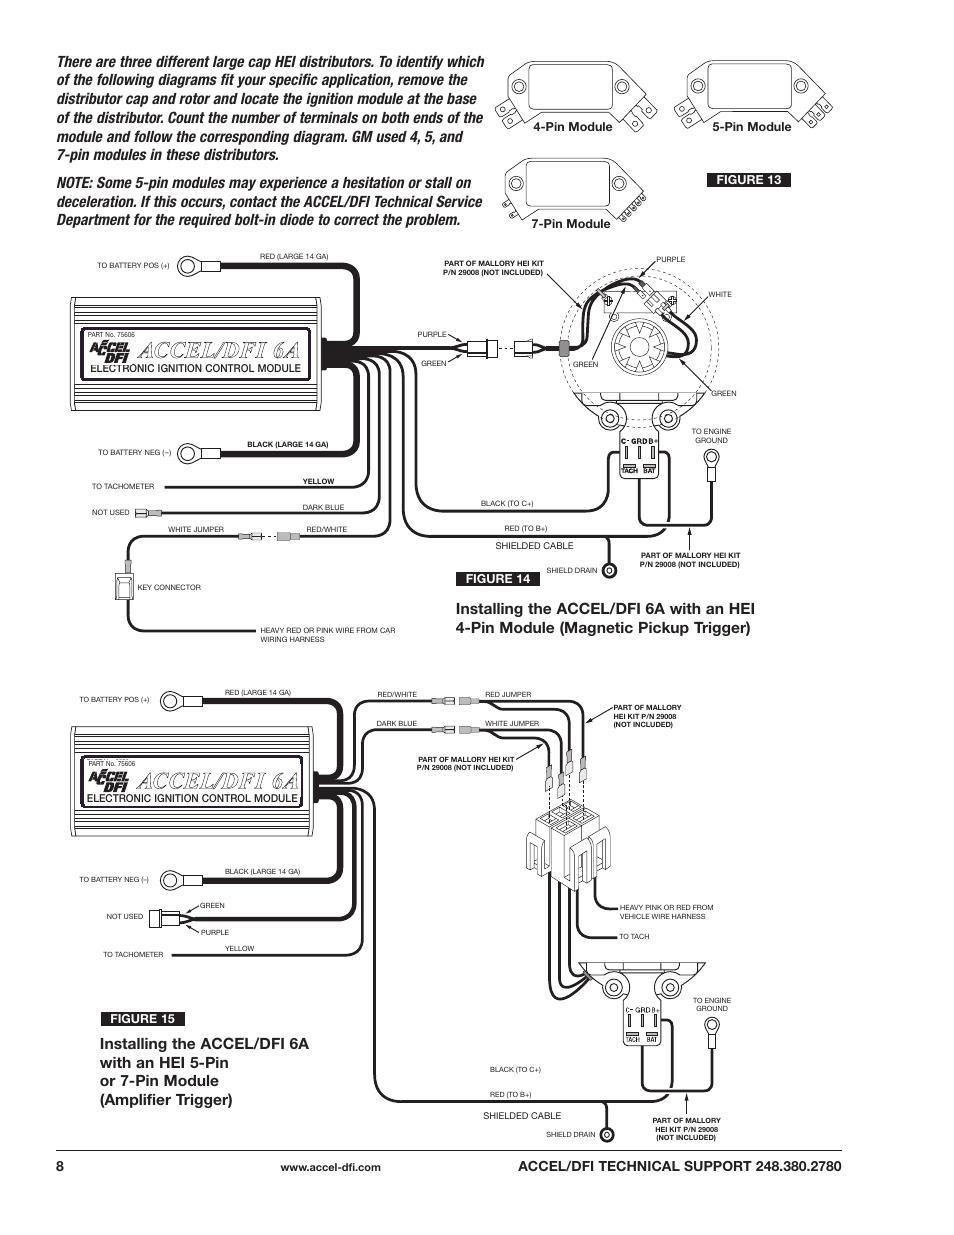 Accel Dfi Controller Wiring Diagram Trusted Distributor Hhy Yf Fiir Re E 6 6a A Aac Cc Ce El L D Df Fii Mallory Rh Manualsdir Com Gen 7 Coil